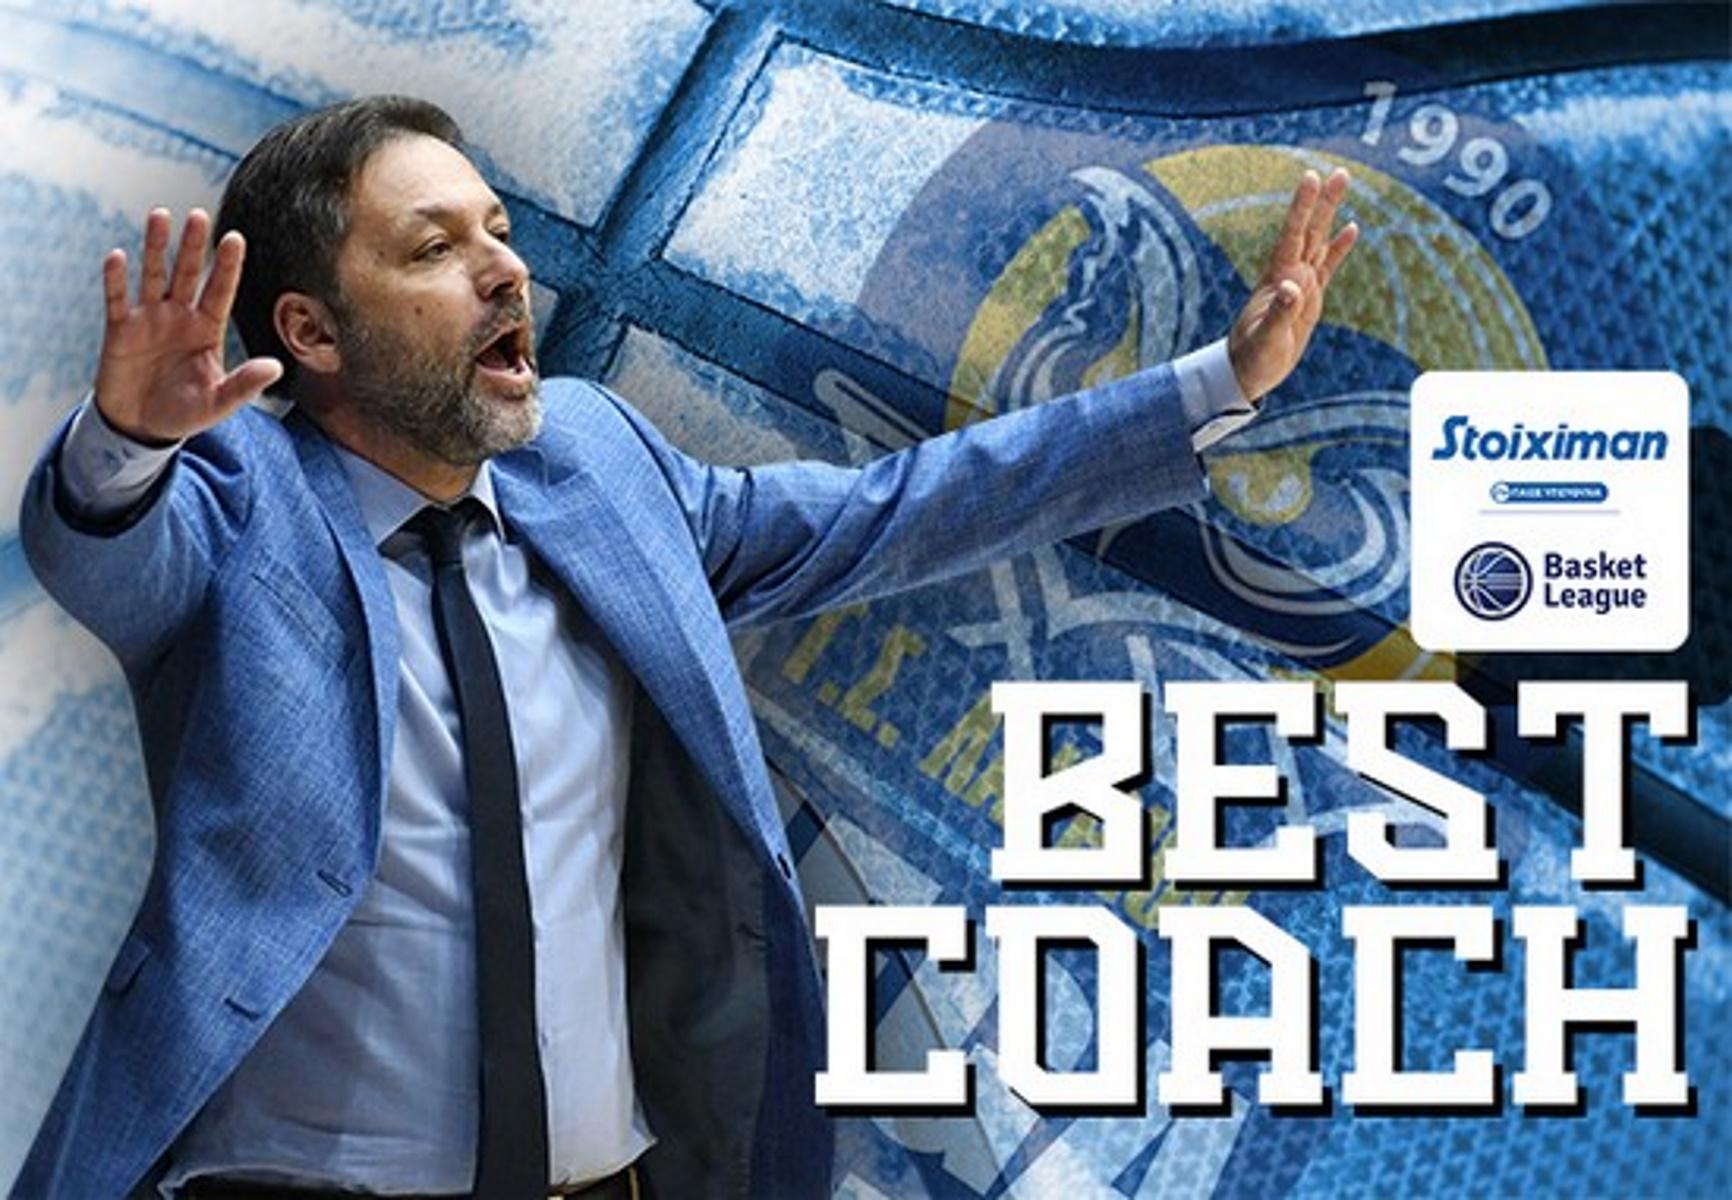 Basket League: Ο Σερέλης του Λαυρίου προπονητής της χρονιάς